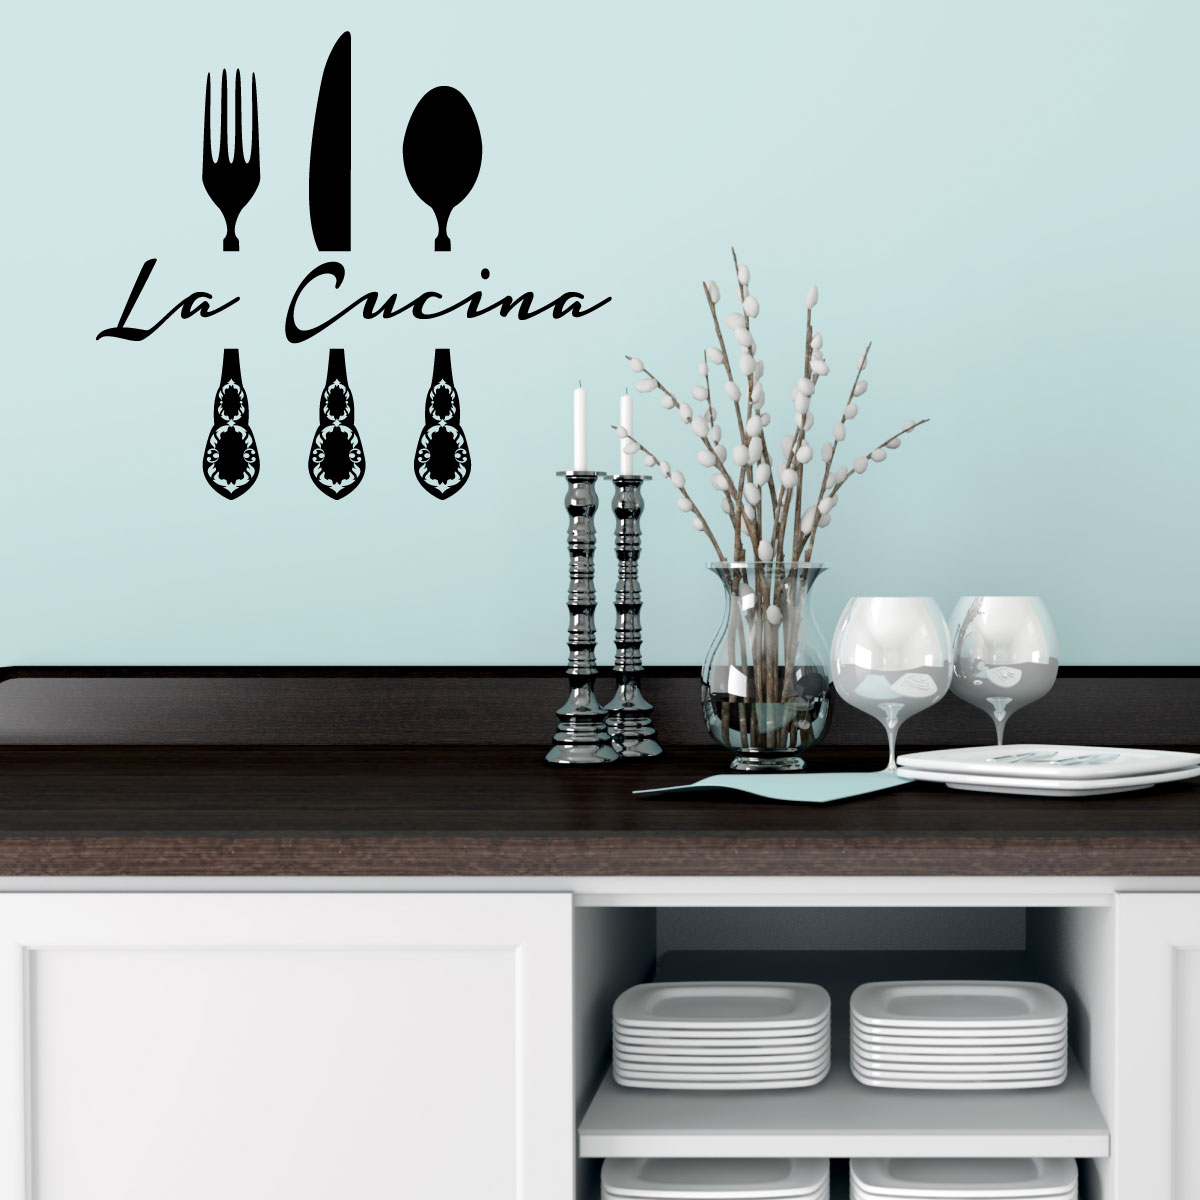 stickers muraux pour la cuisine sticker la cucina 2 ambiance. Black Bedroom Furniture Sets. Home Design Ideas